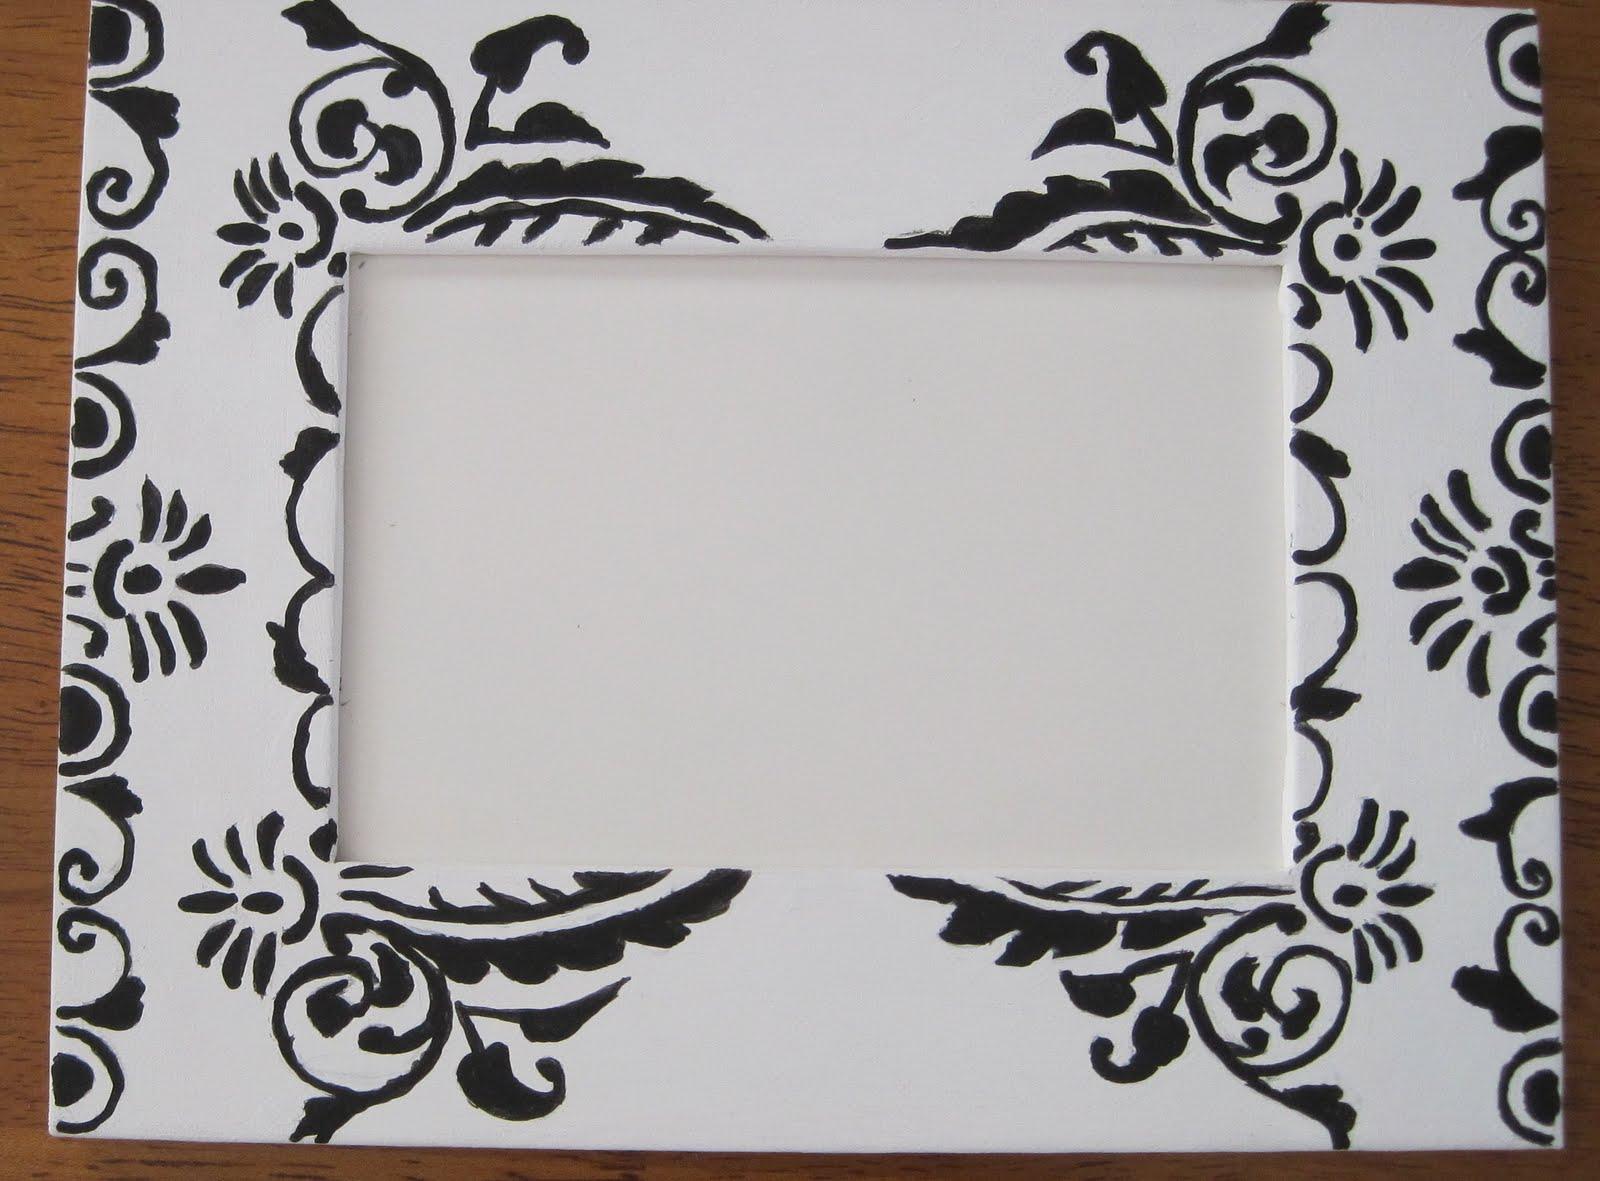 sewing economist wedding invitation frame